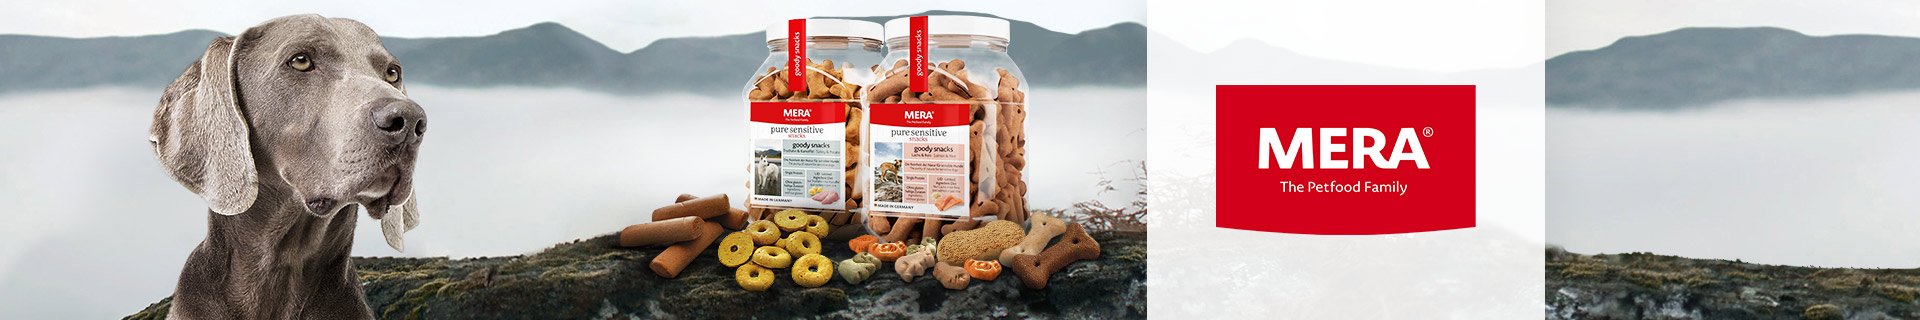 Markenshop - Mera - Snacks - Hund